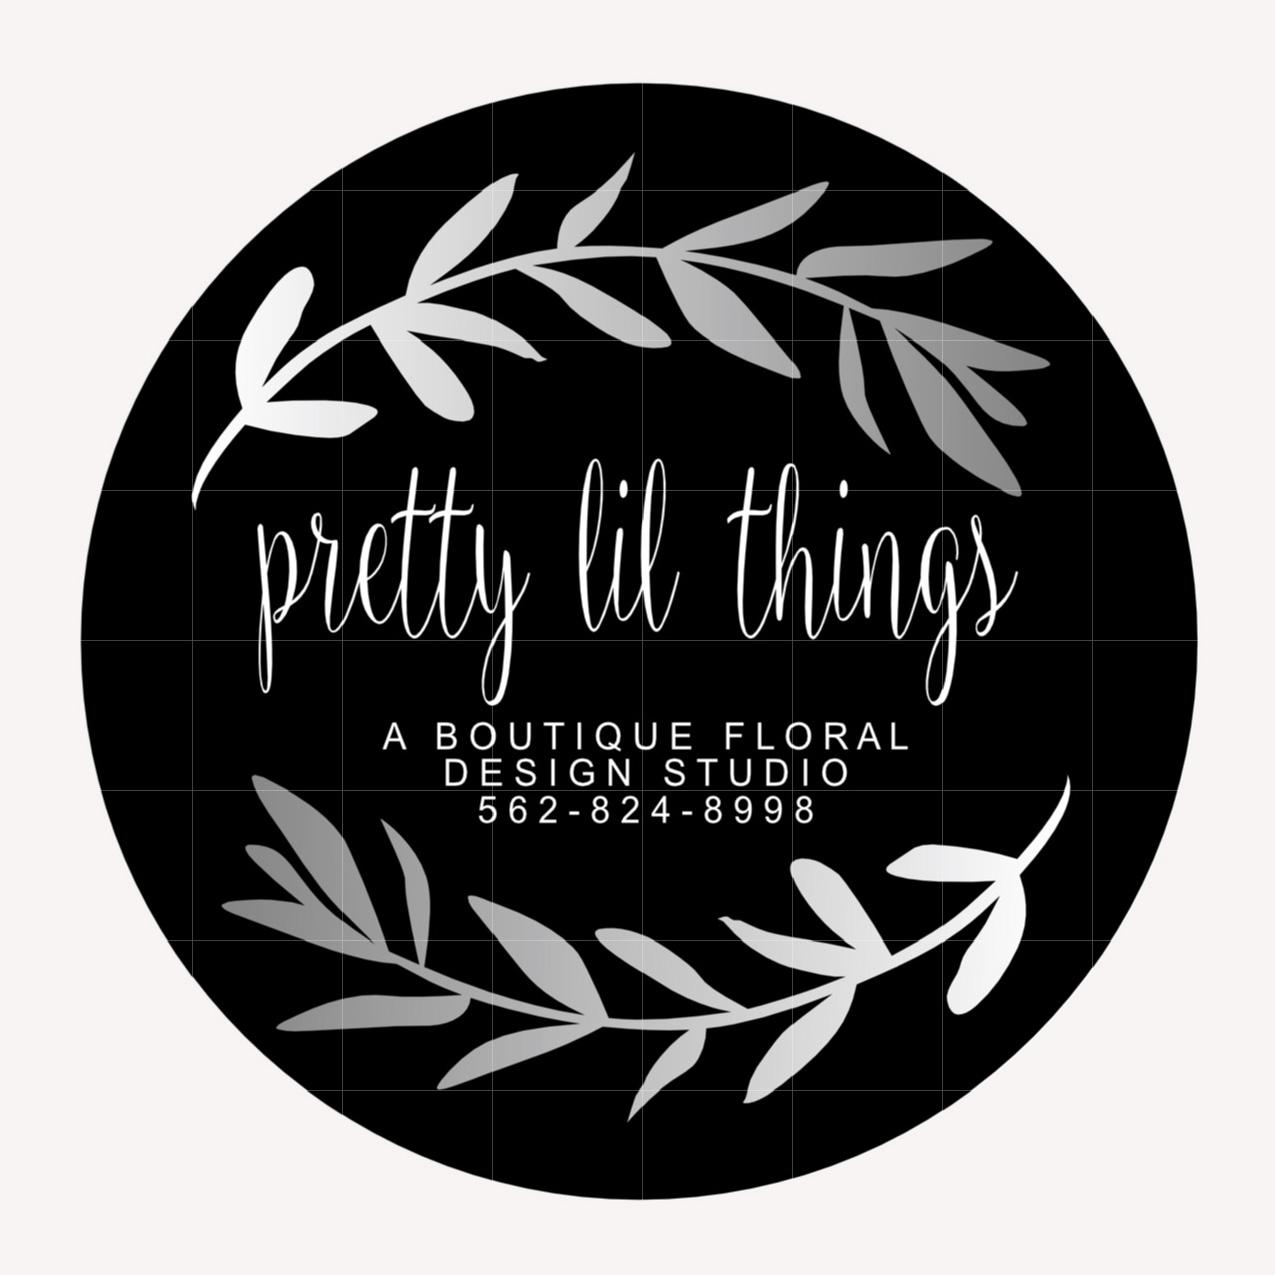 pretty-little-things.jpg